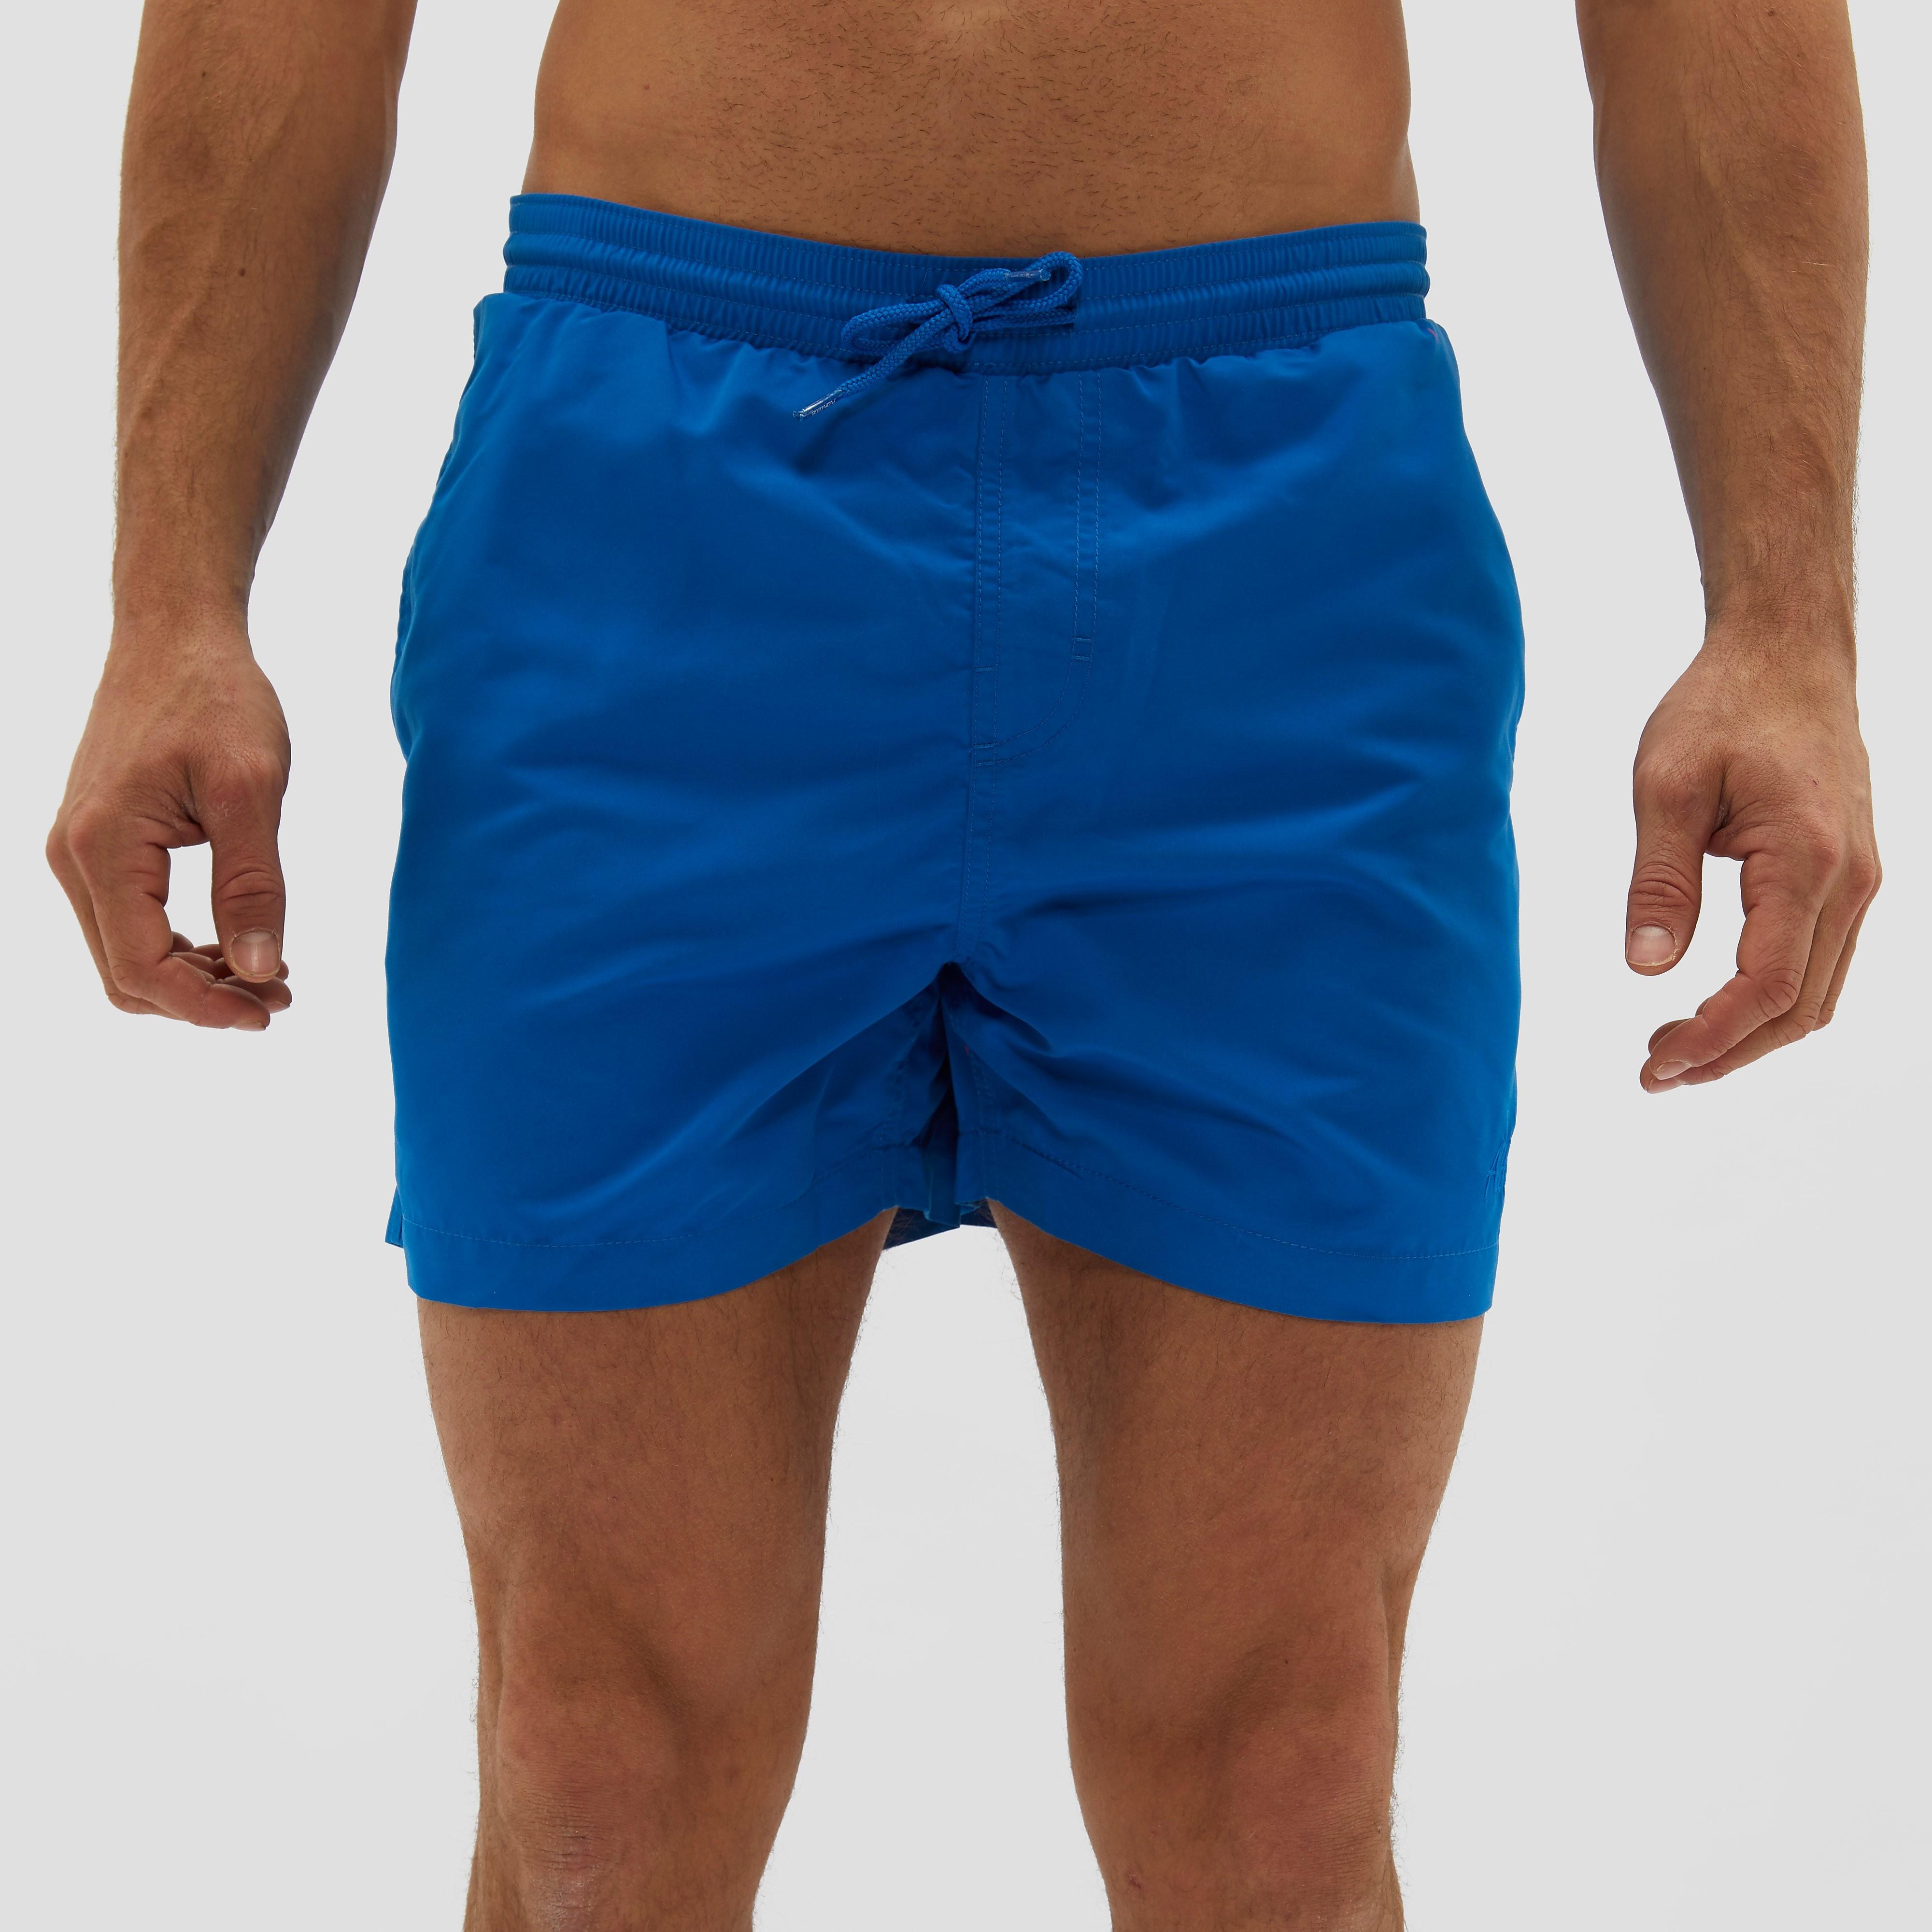 Akow Boardshort Blauw Heren - D.Blue thumbnail